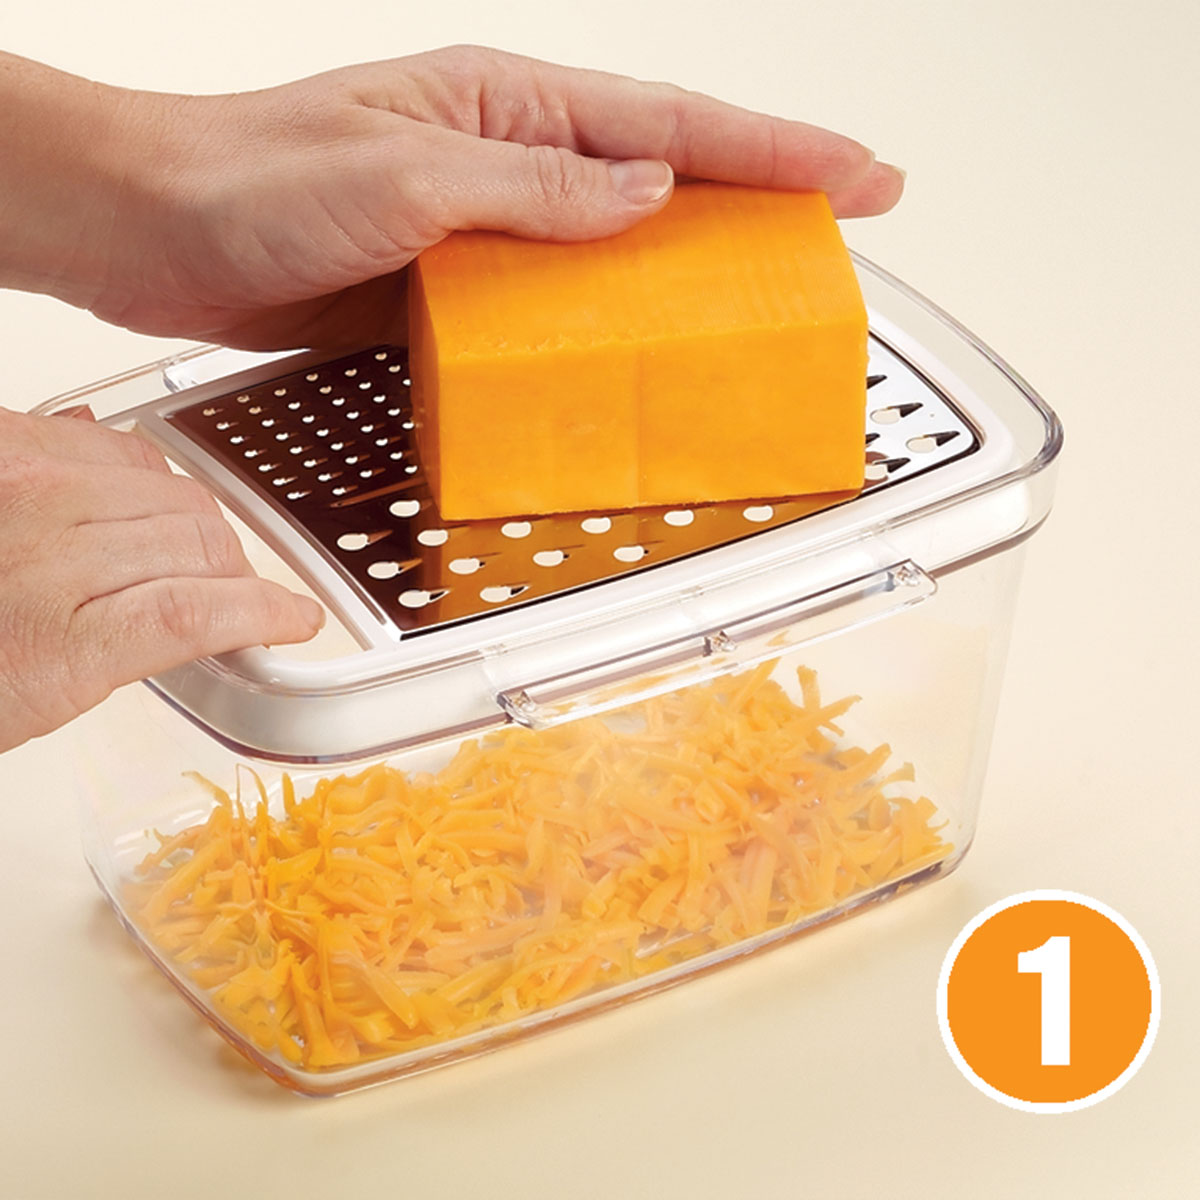 Foodsaver 174 Rectangular Canister With Bonus Cheese Grater